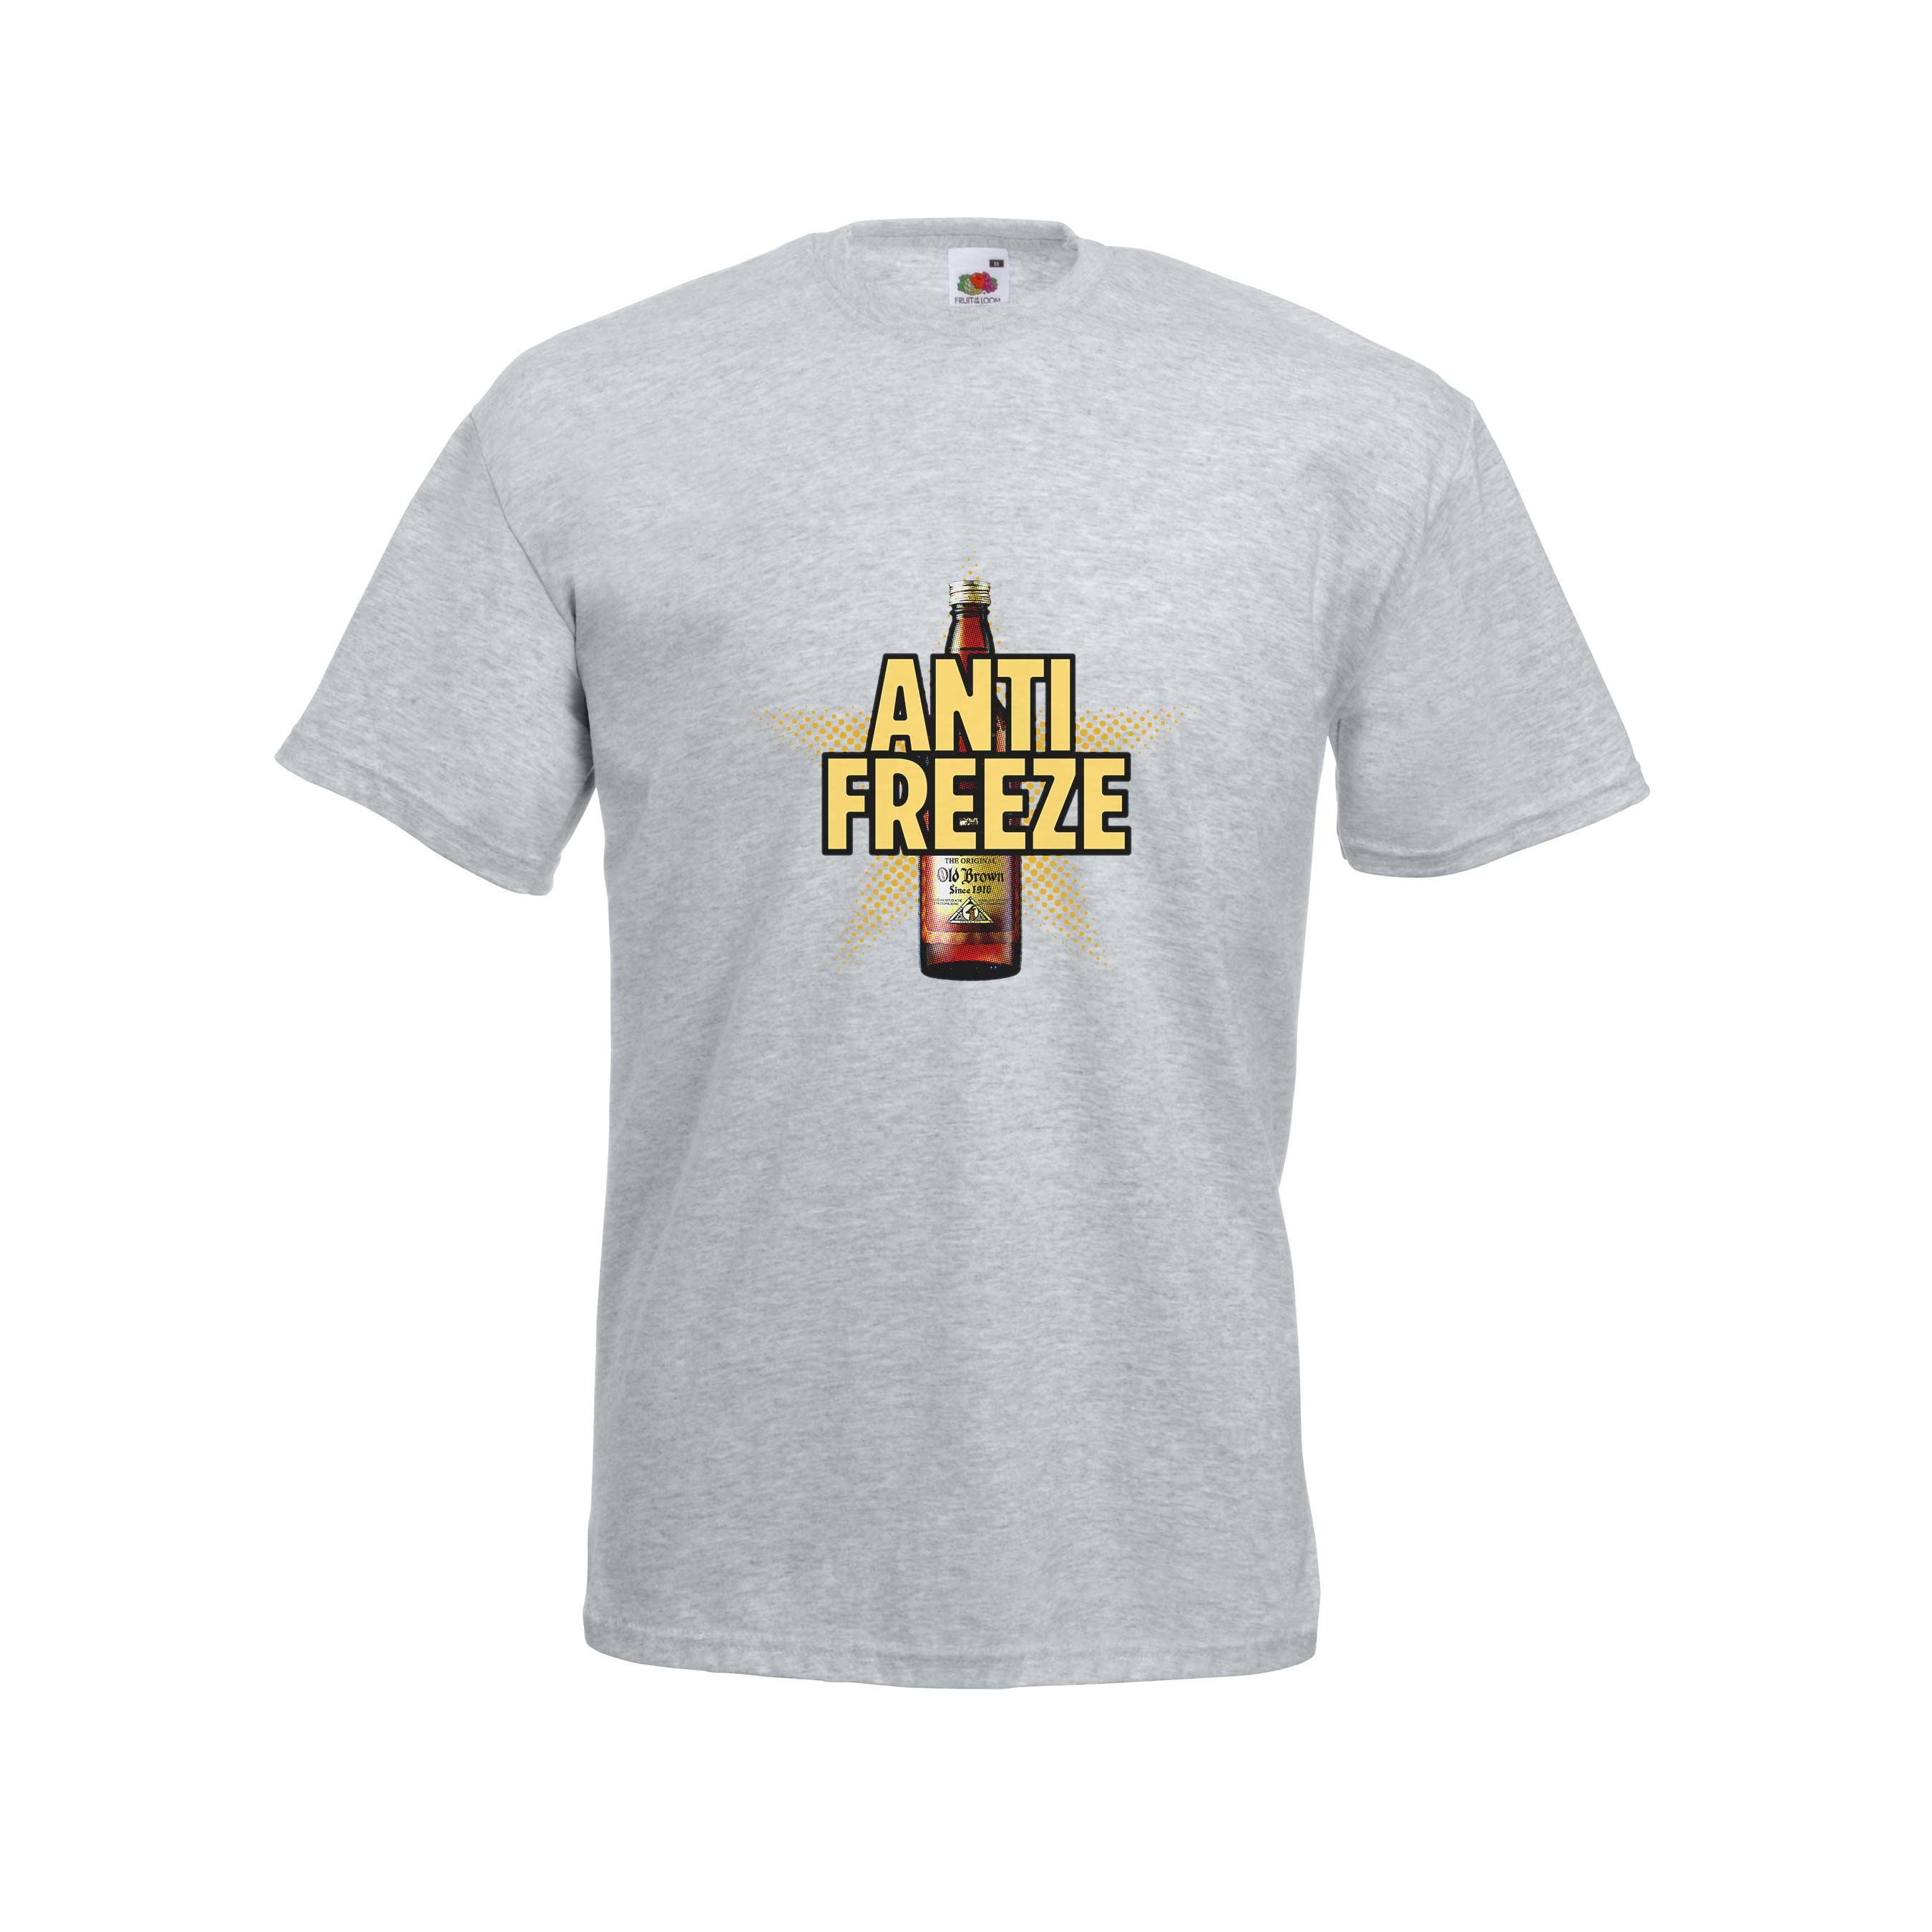 Anti-freeze design for t-shirt, hoodie & sweatshirt